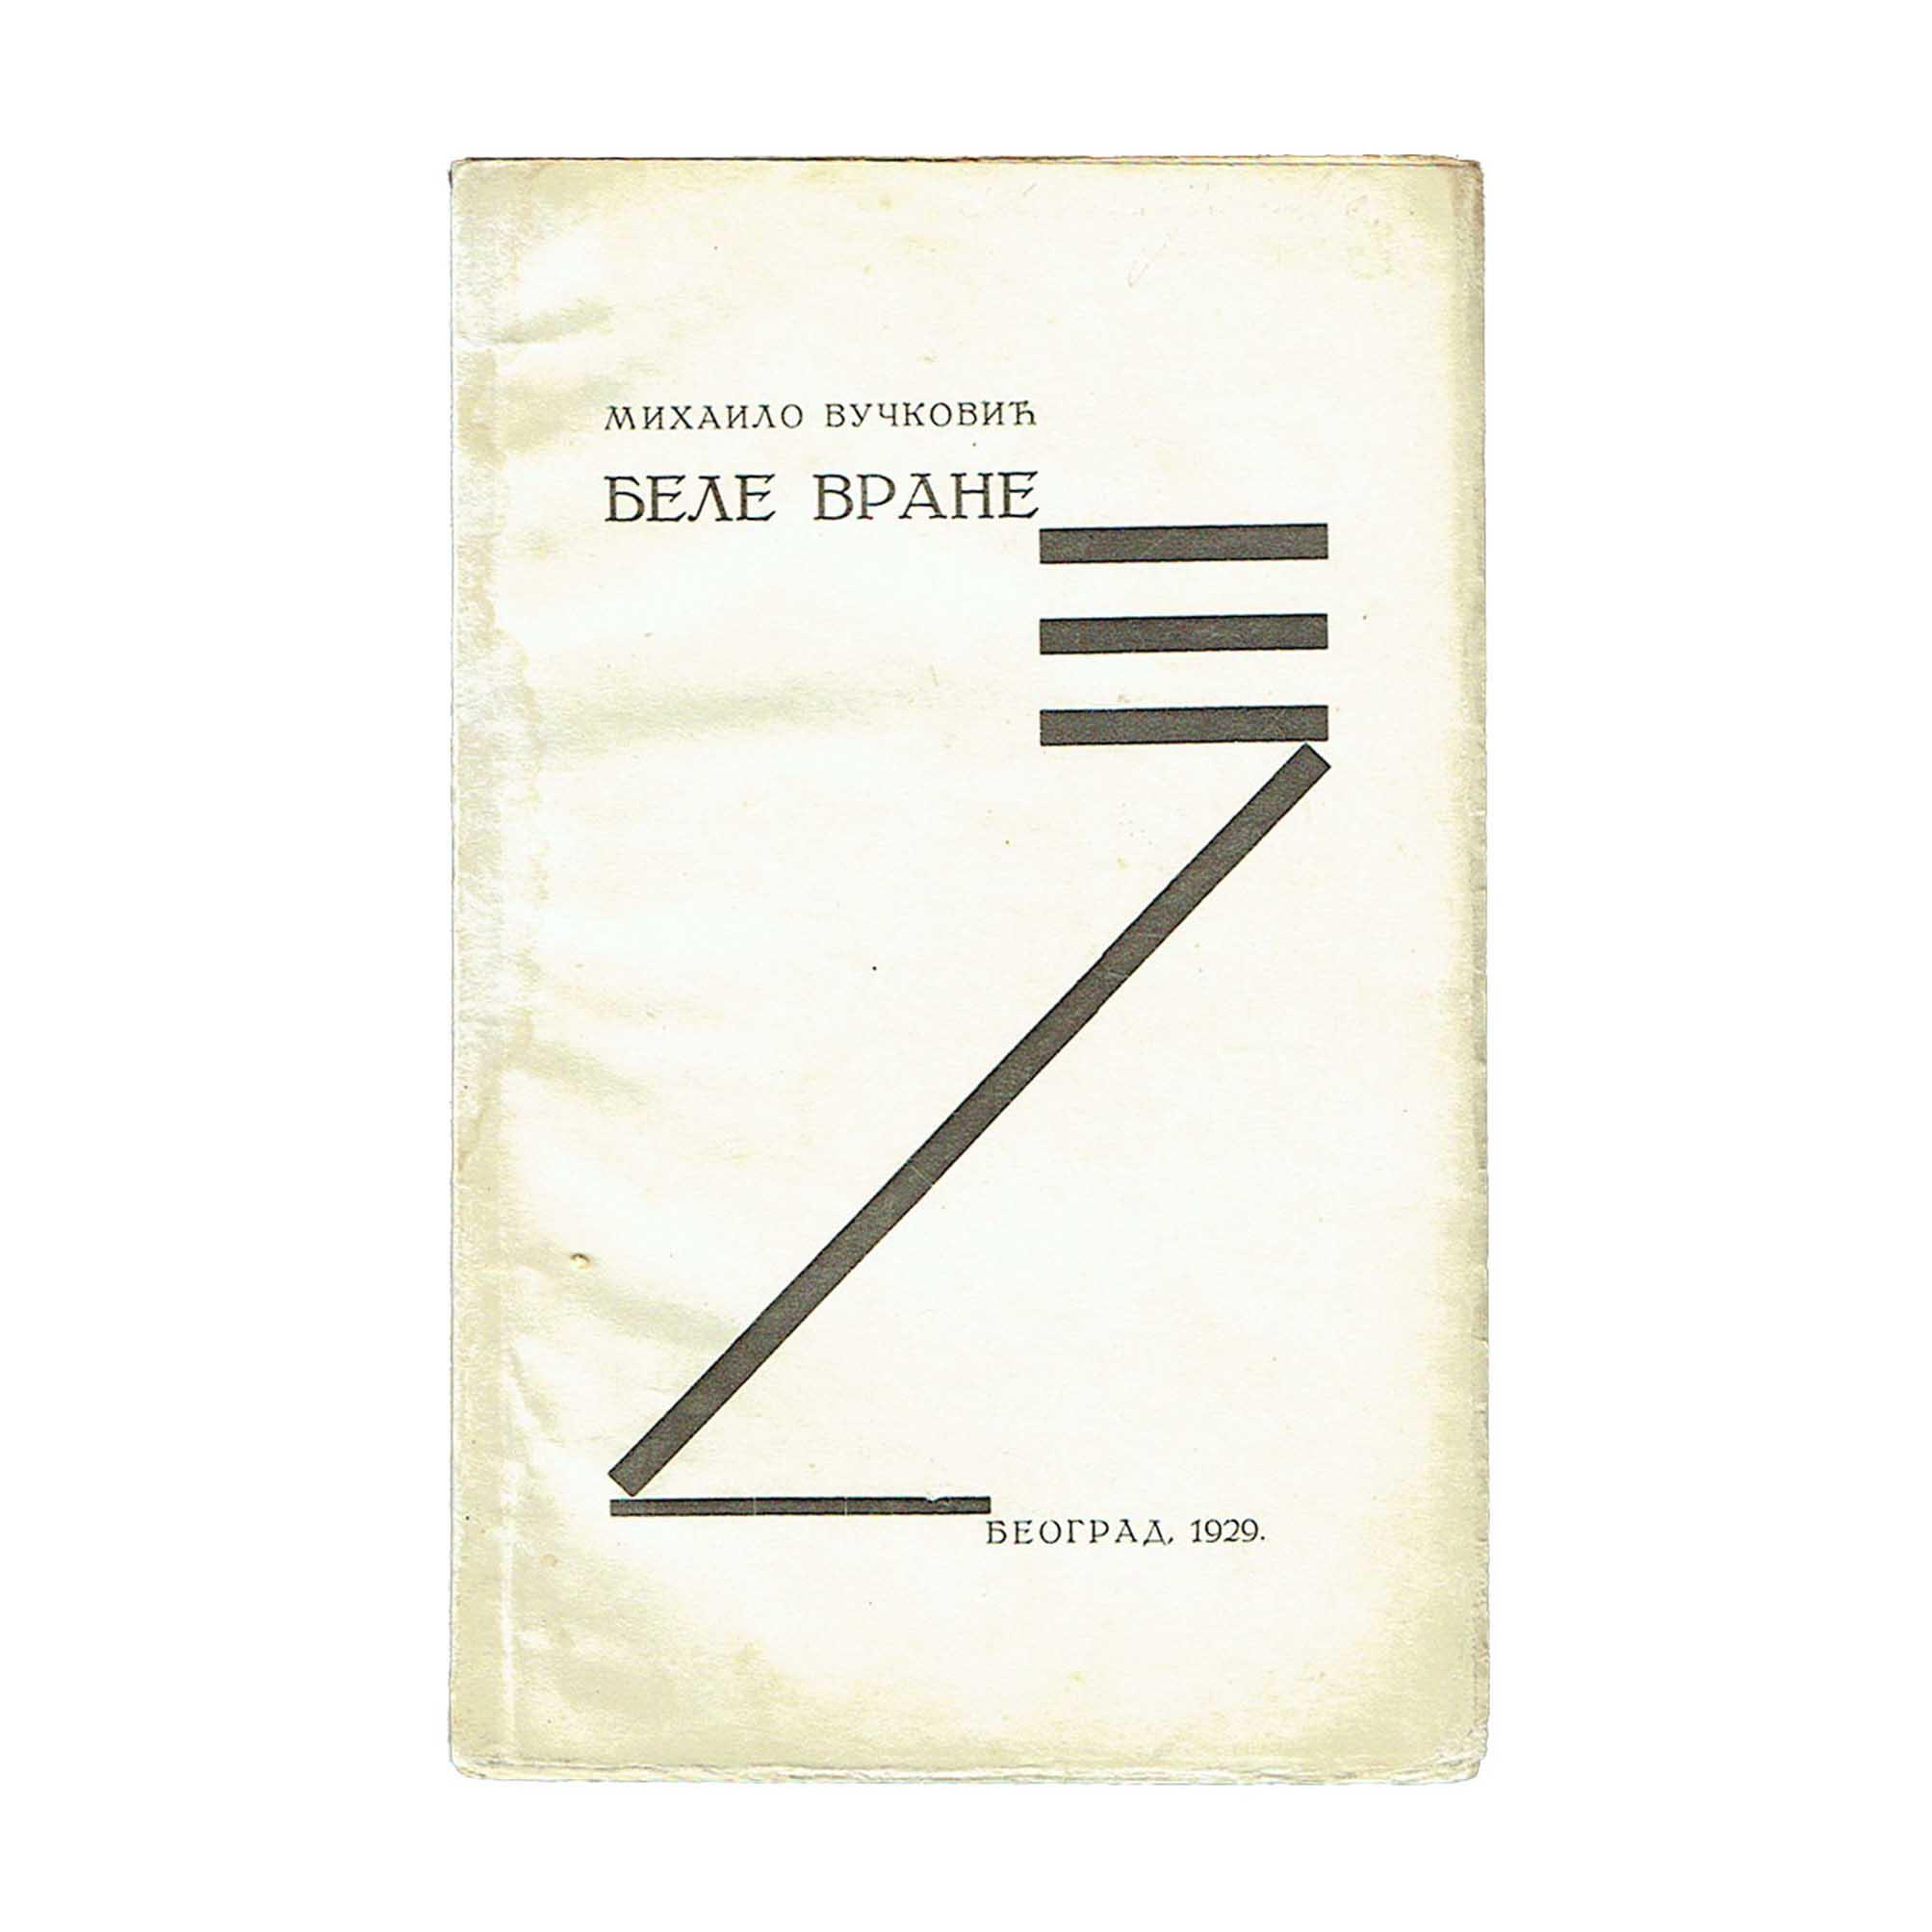 5925-Vuckovic-Popovic-Bele-Vrane-1929-Umschlag-recto-frei-N.jpeg